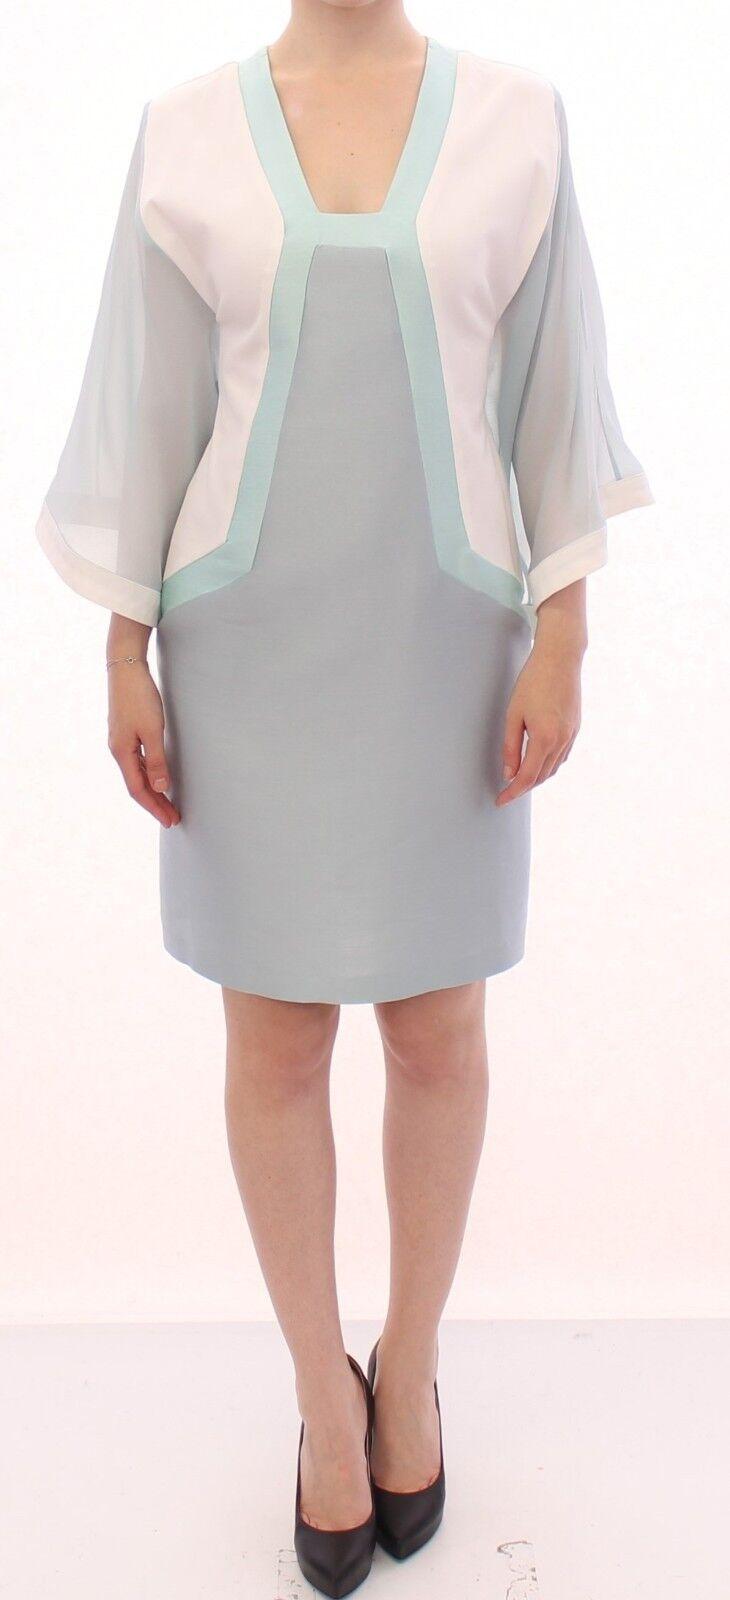 NWT  SERGEI GRINKO Turquoise White Silk Sheath Formal Dress IT40   US 6   S